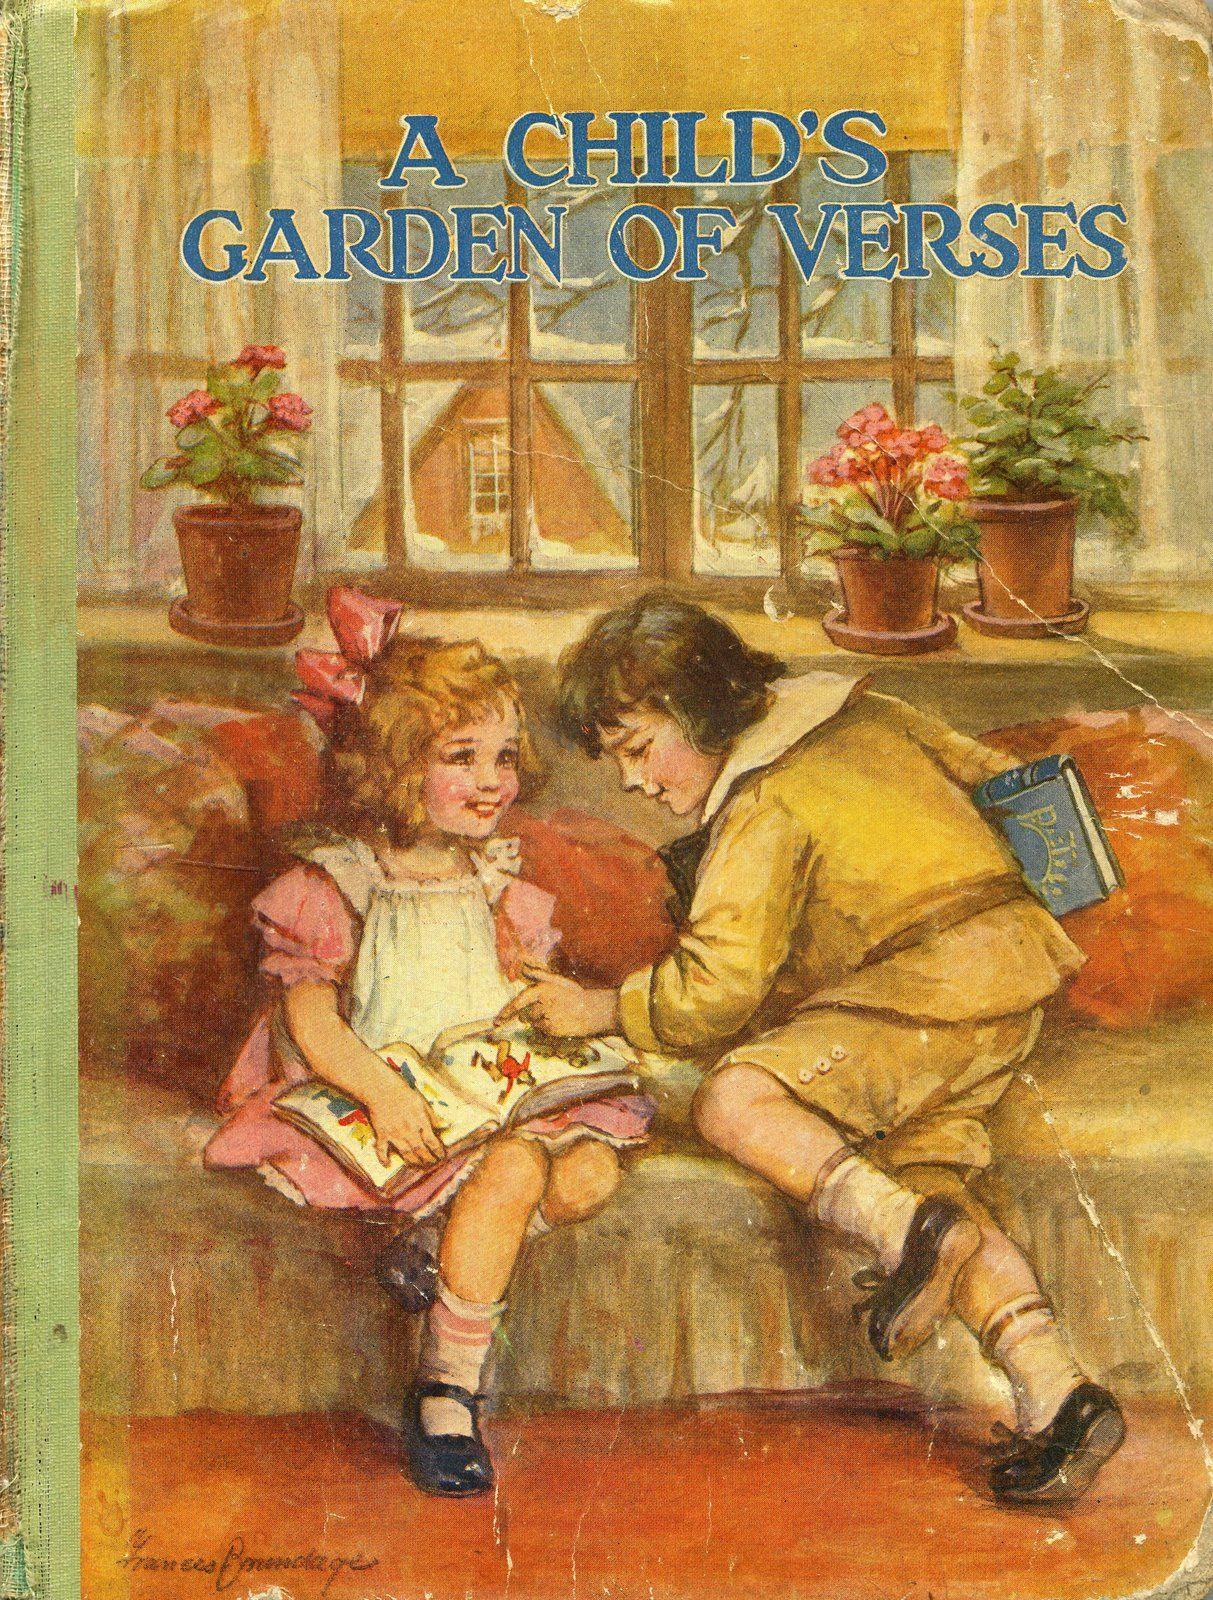 Frances brundage old childrens books childrens books